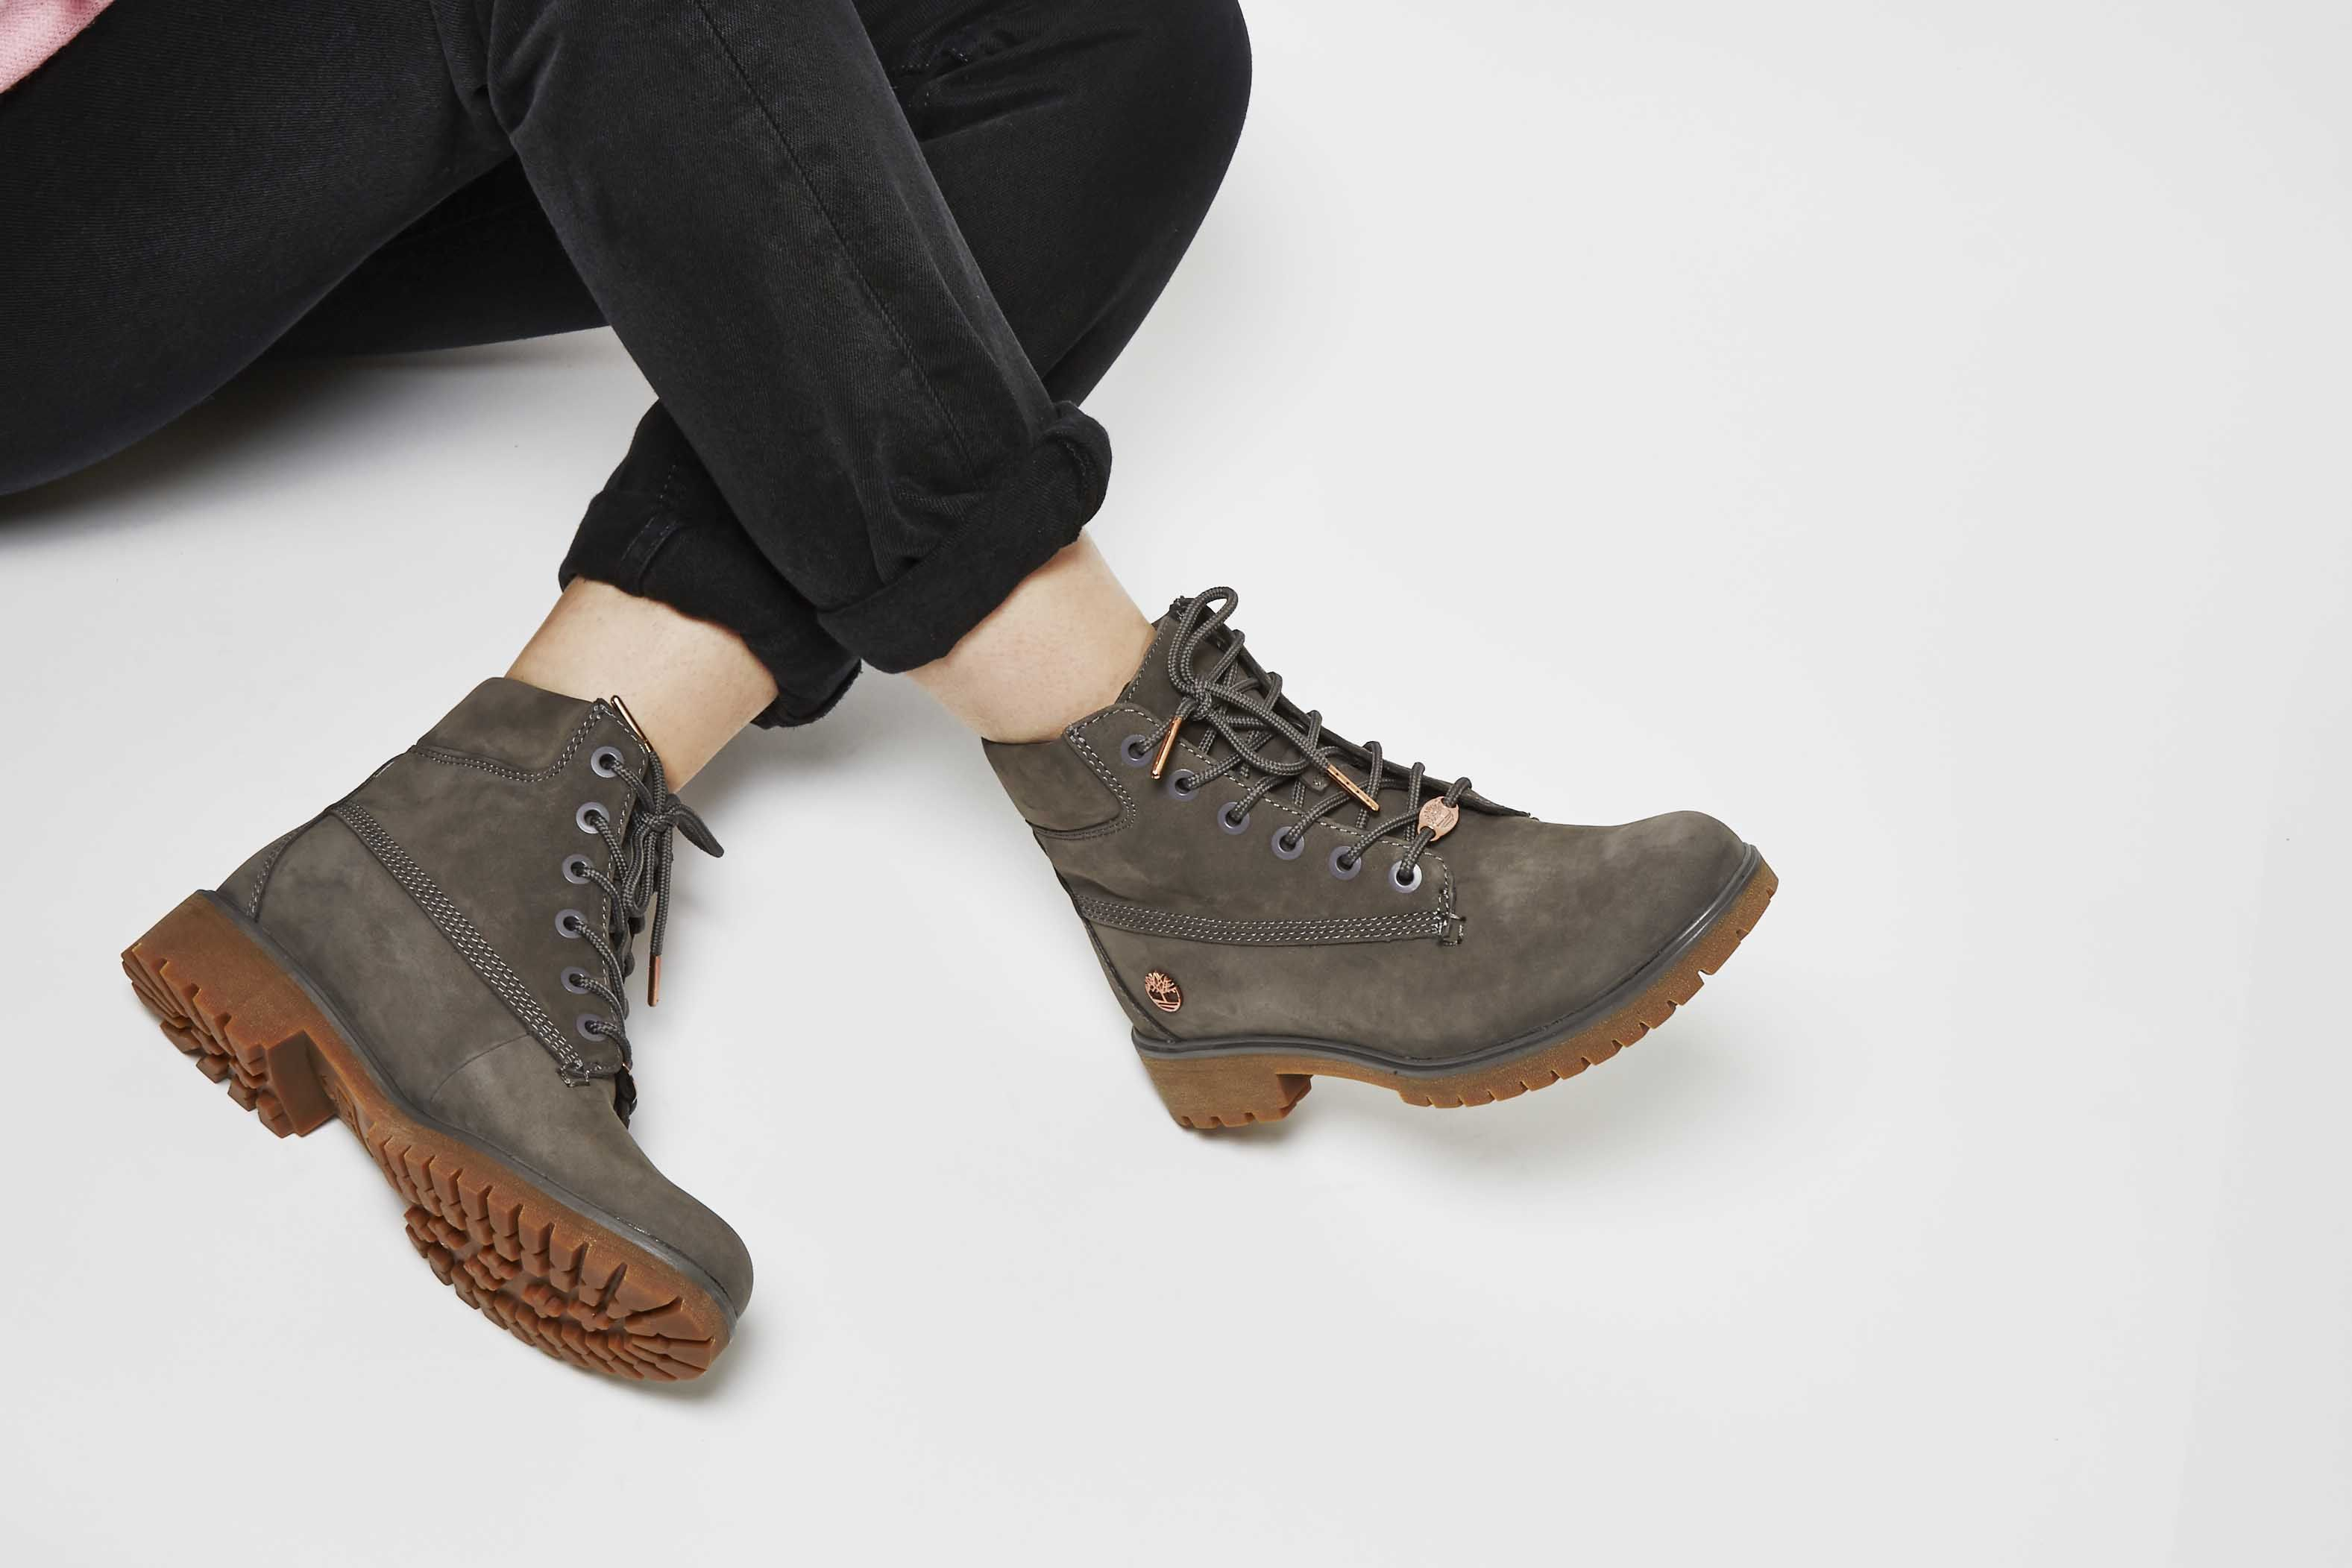 d8a92239ca6b Timberland Slim Premium 6 Inch Boots Eiffel Tower Grey Nubuck £130.00